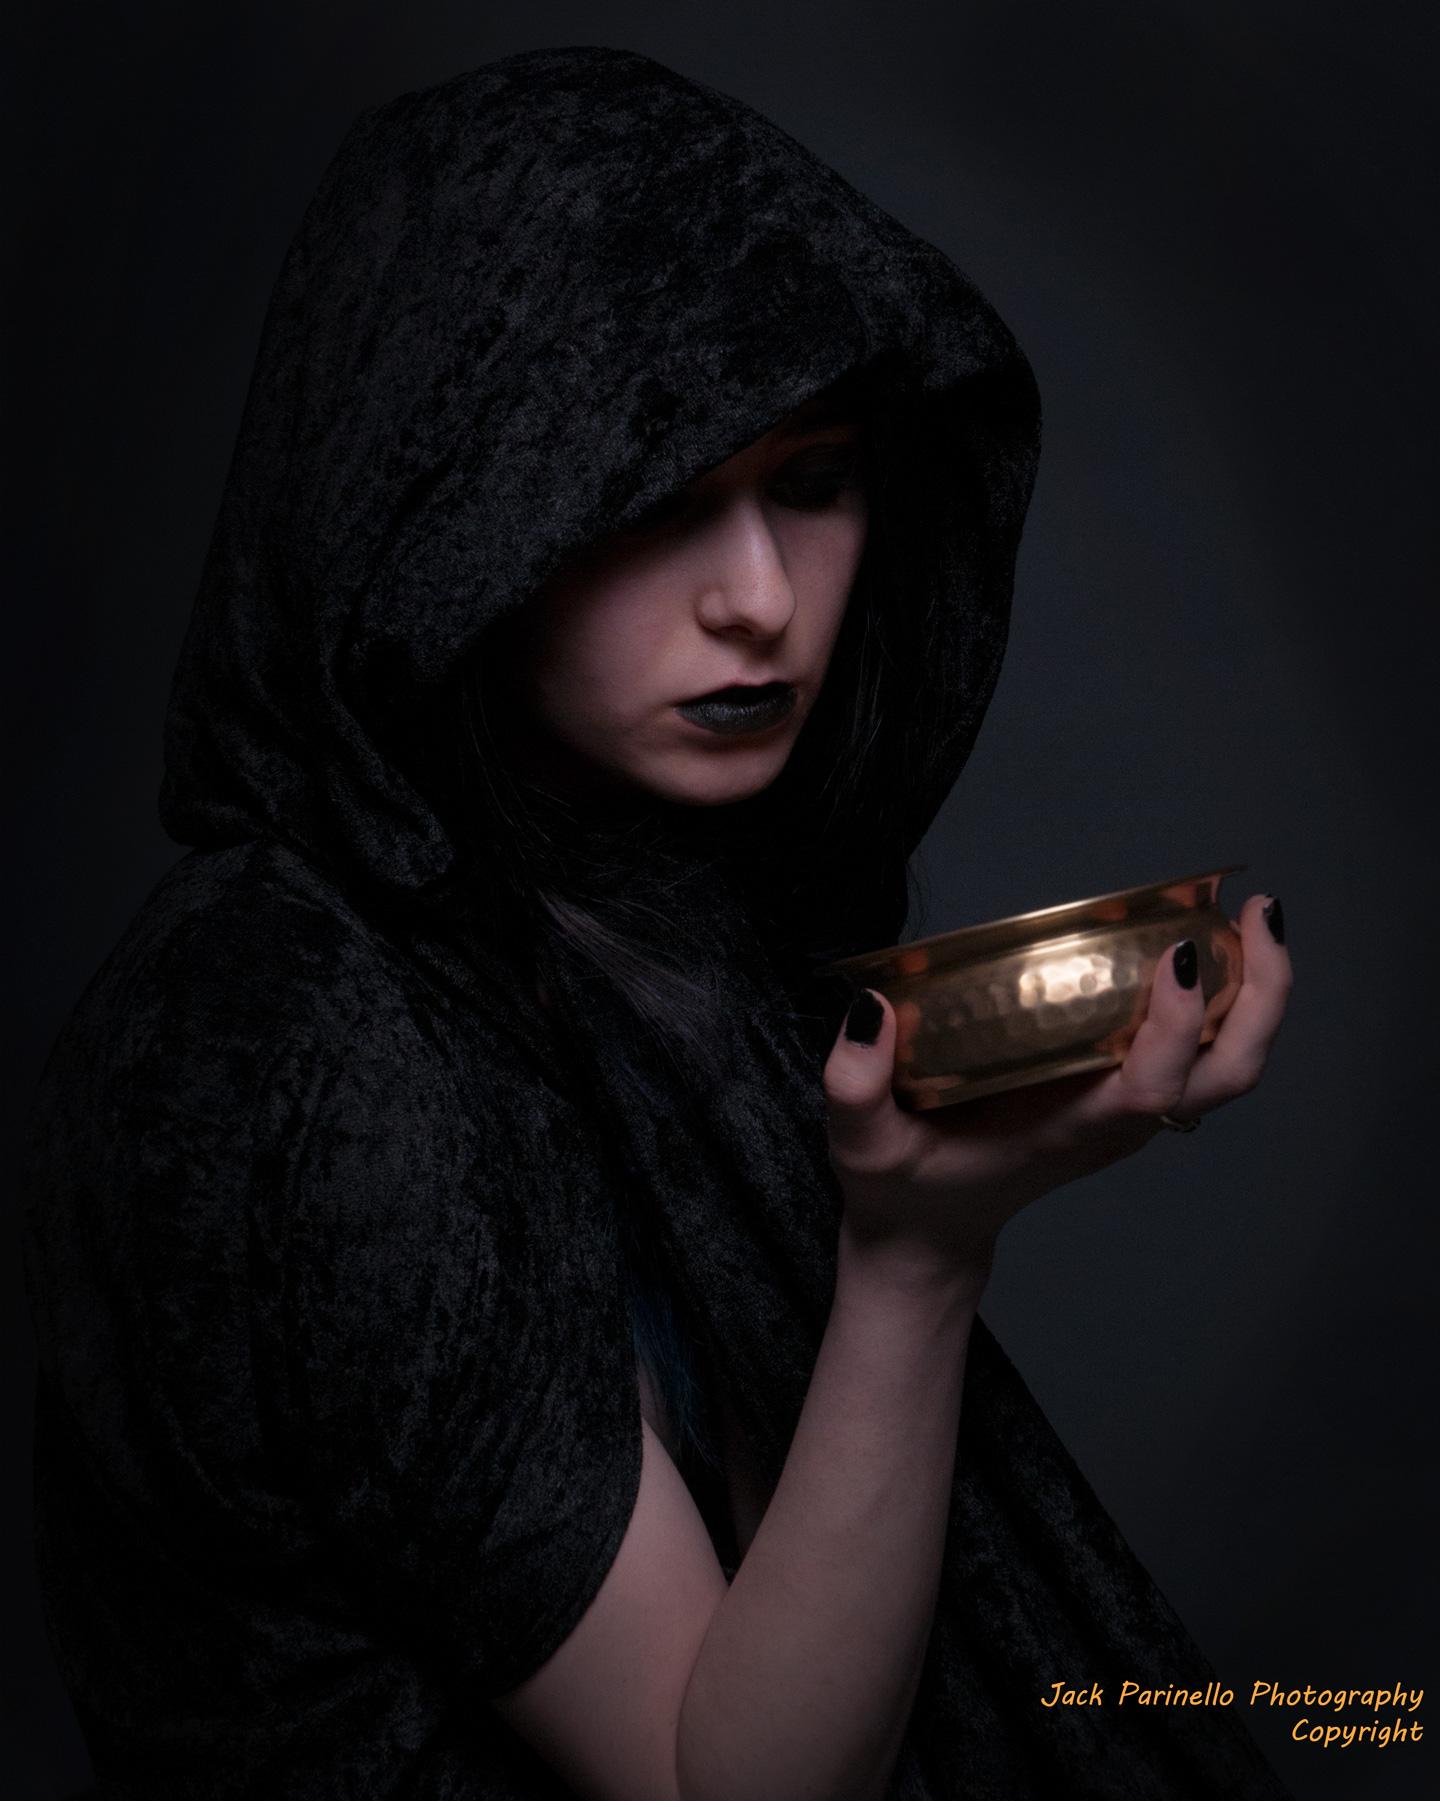 Photo by Jack Parinello Makeup by Katie O'Rear Model Katie O'Rear 001.jpg